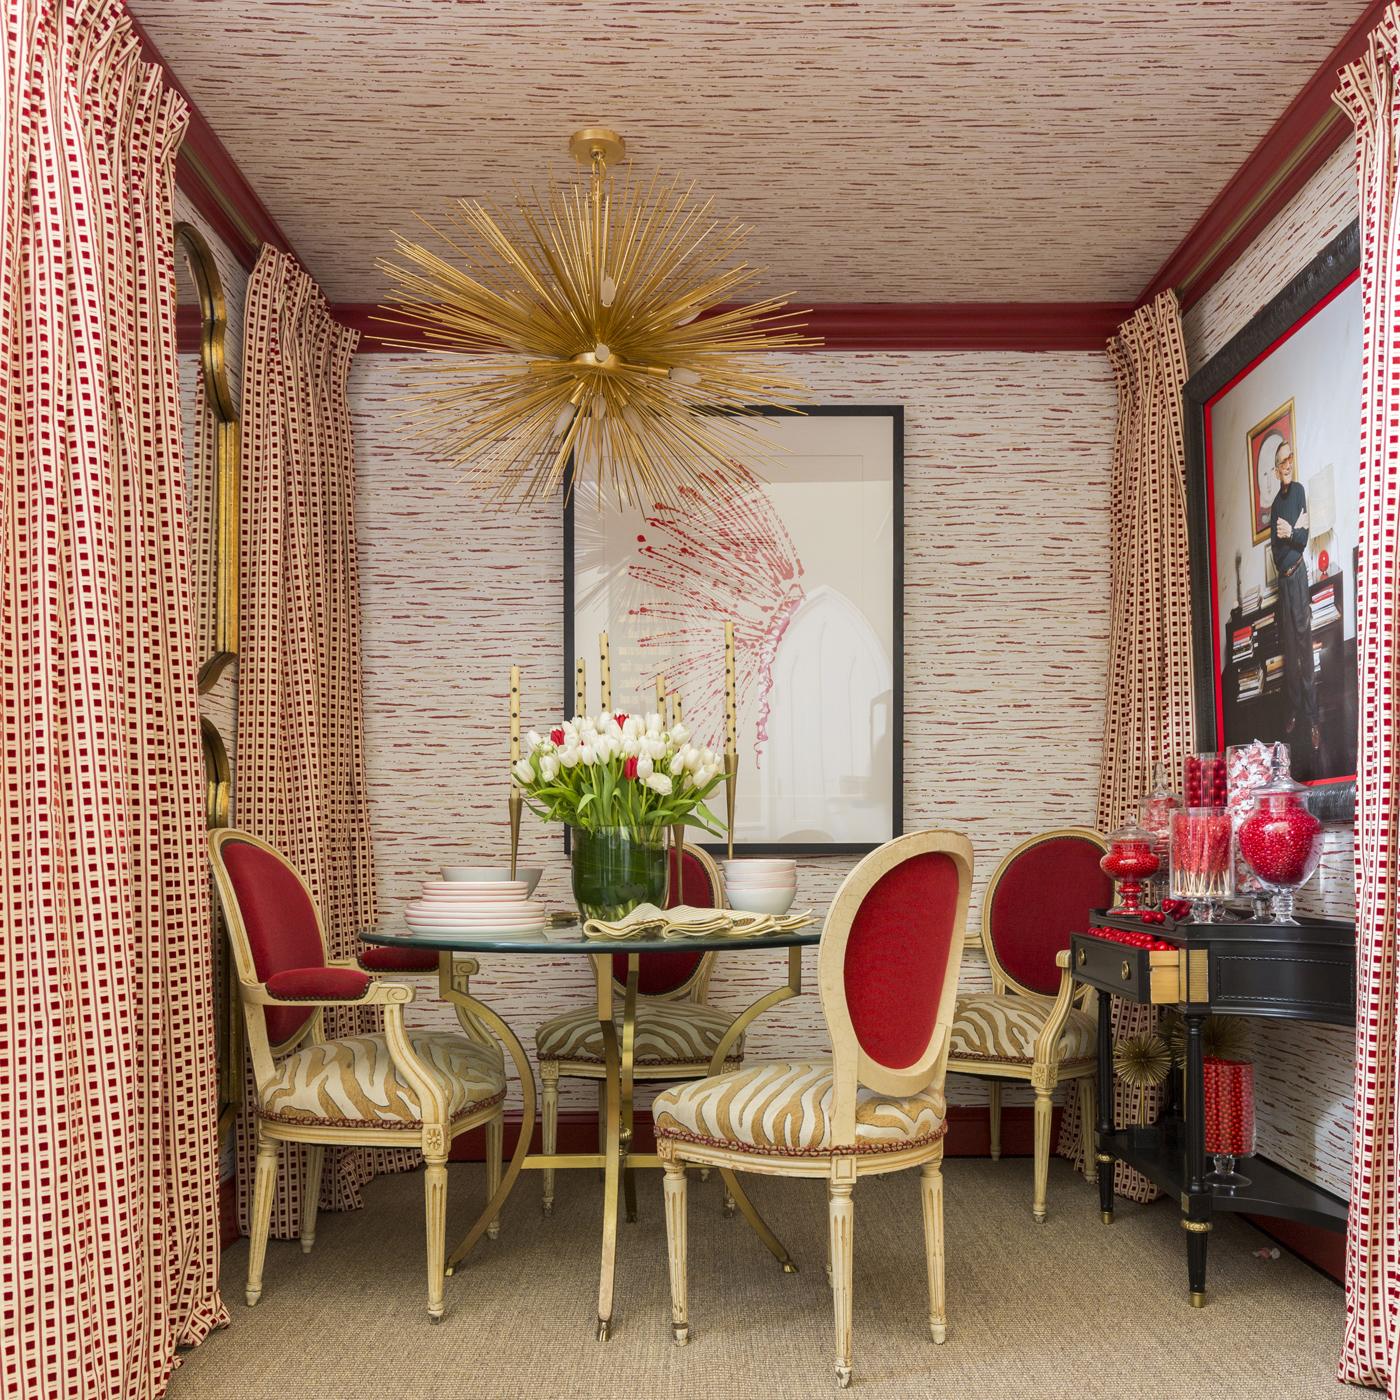 Kelly Wearstler's Strada Chandelier for Circa Lighting anchors the Albert Hadley inspired dining space   Savage Interior Design